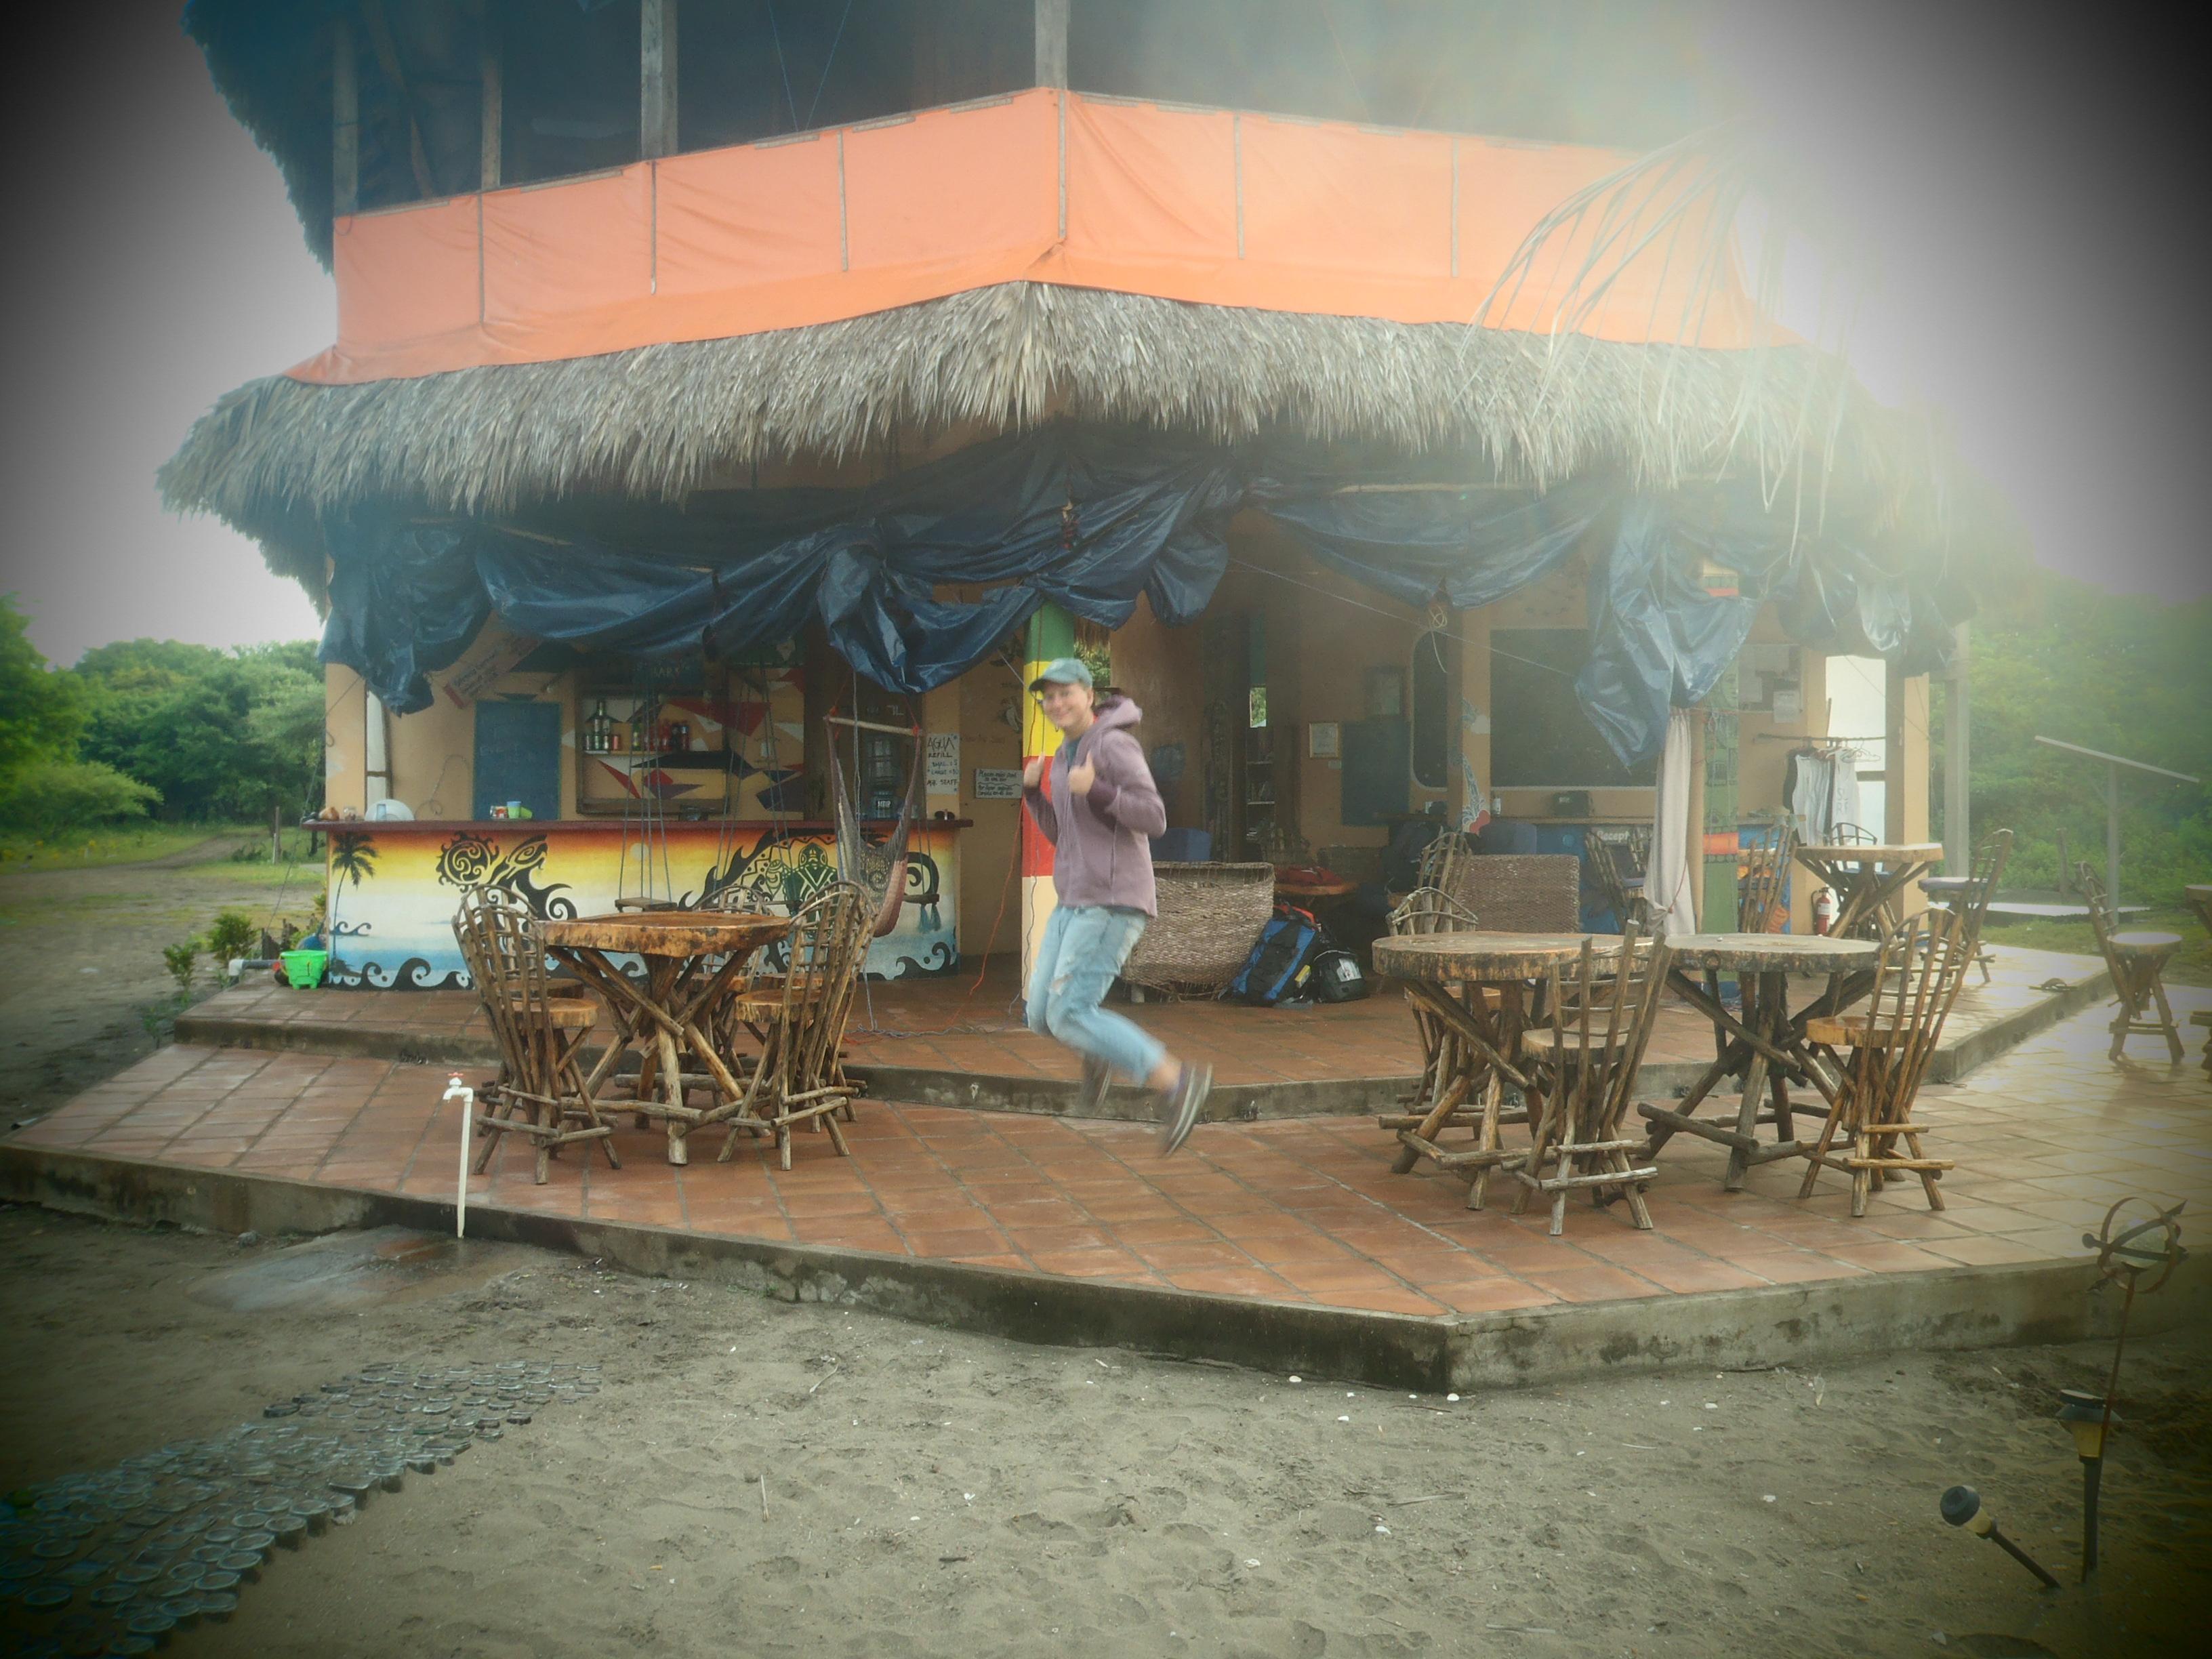 Signature Jumpin' Photograph; Isla Los Brasiles, Nicaragua; 2013